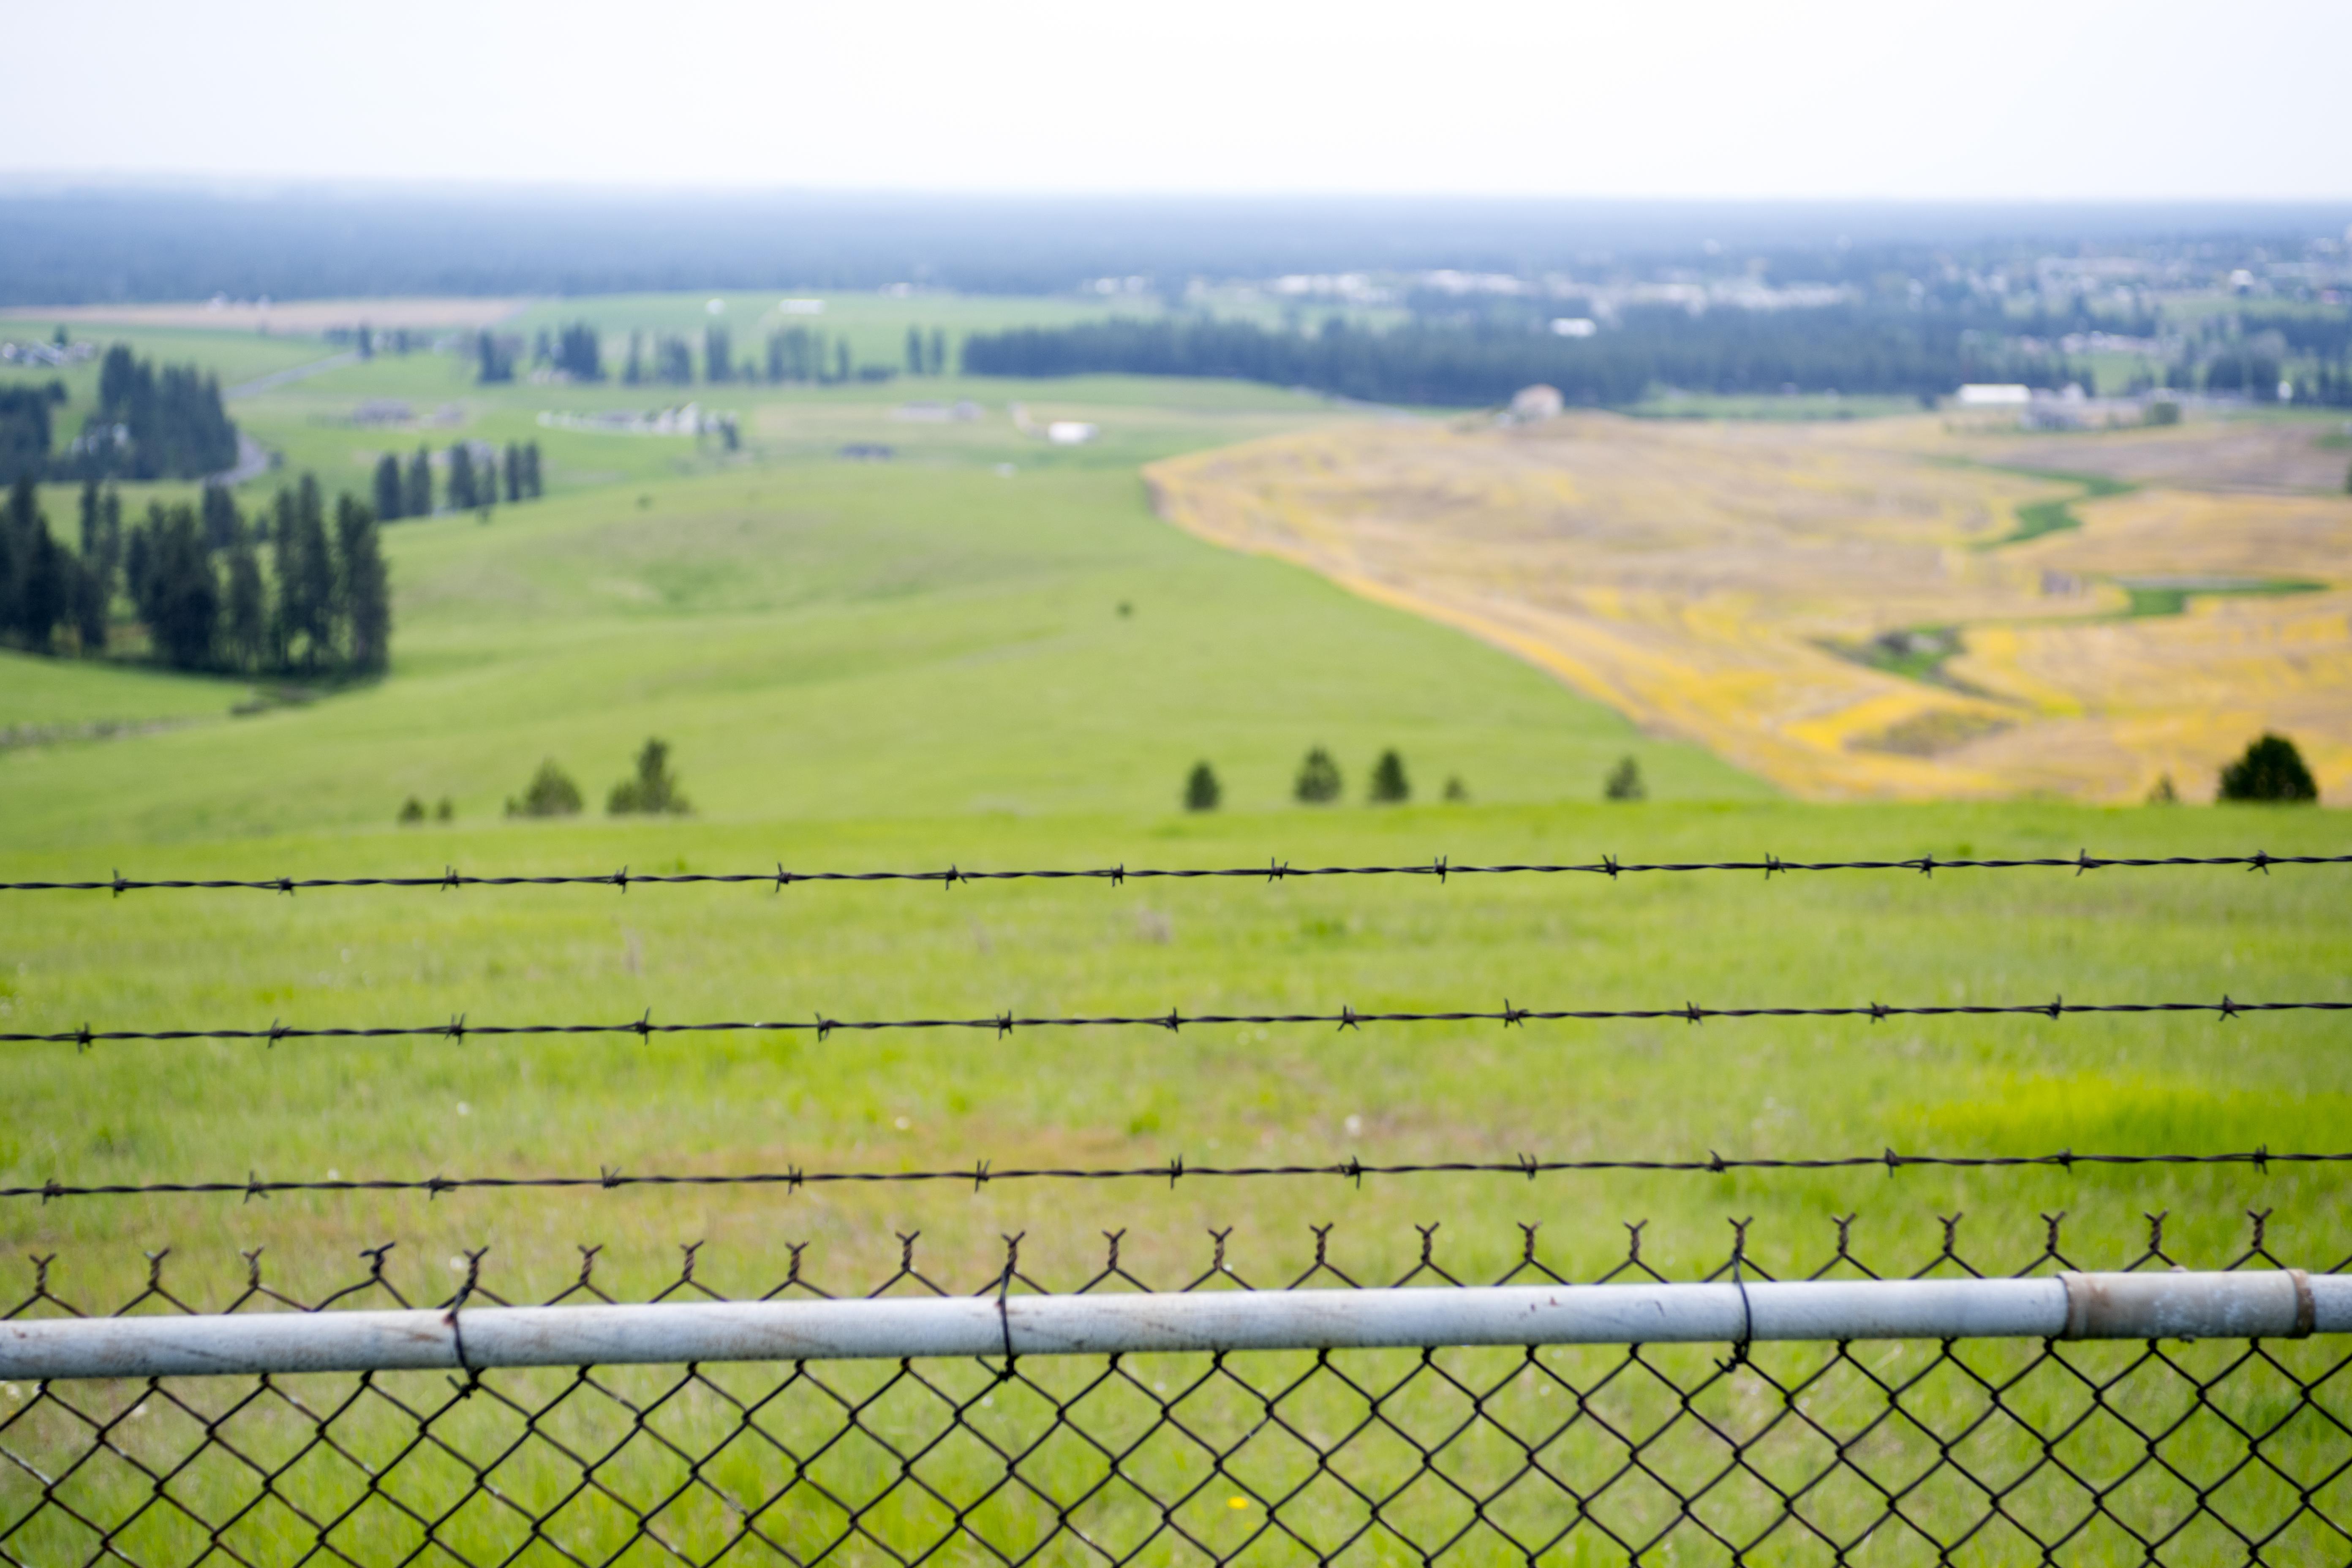 Cheney announces mandatory irrigation shutdown | The Spokesman-Review